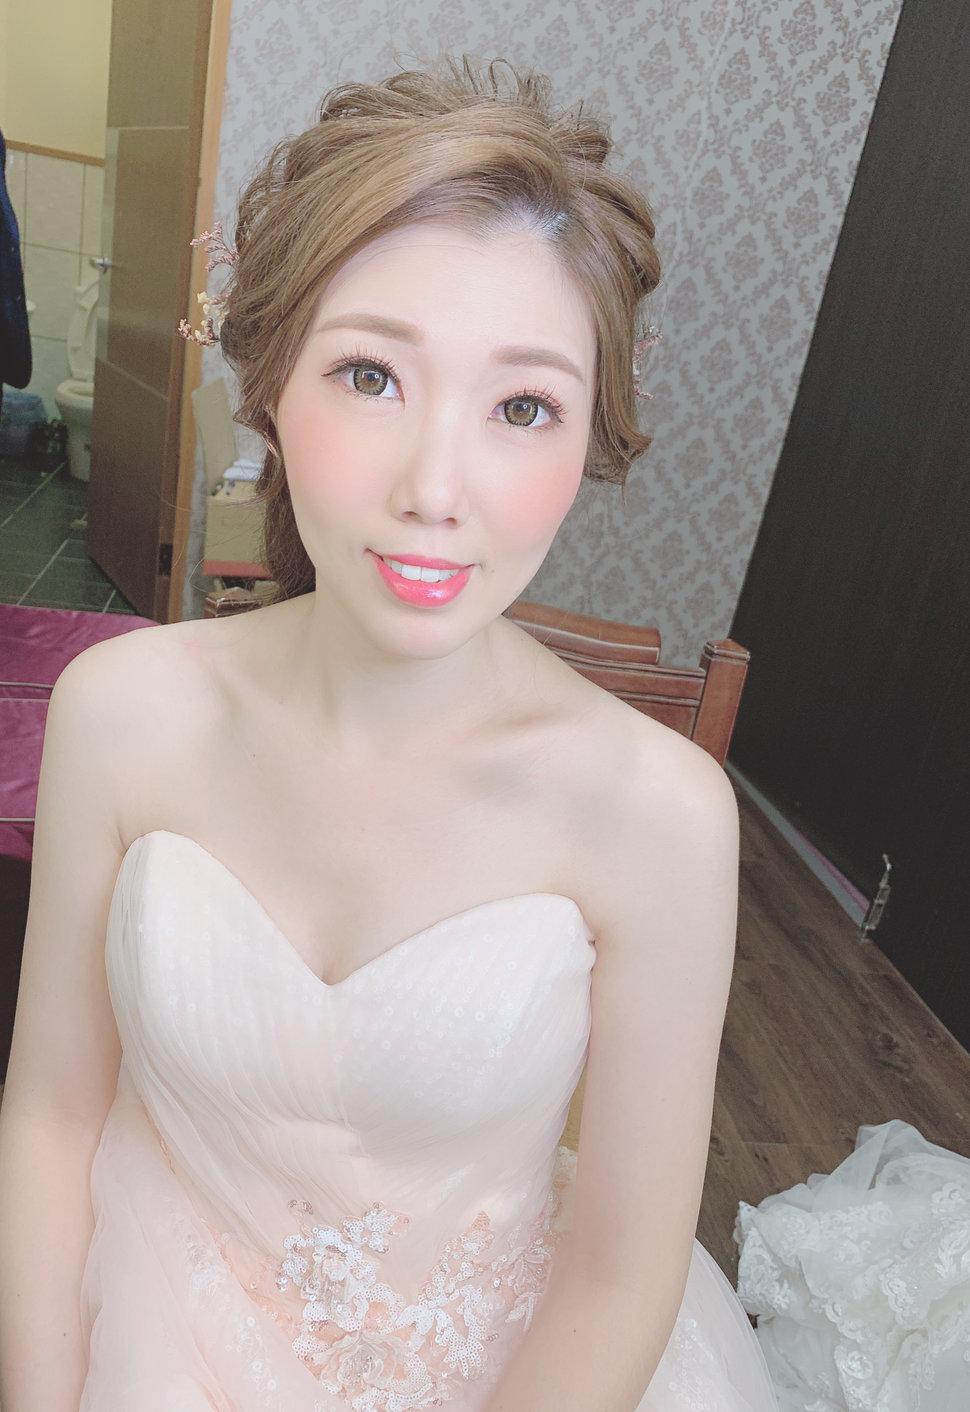 1036202A-197E-4199-873A-88B84B07F657 - Fanny造型工作室 新娘秘書 自助婚紗《結婚吧》